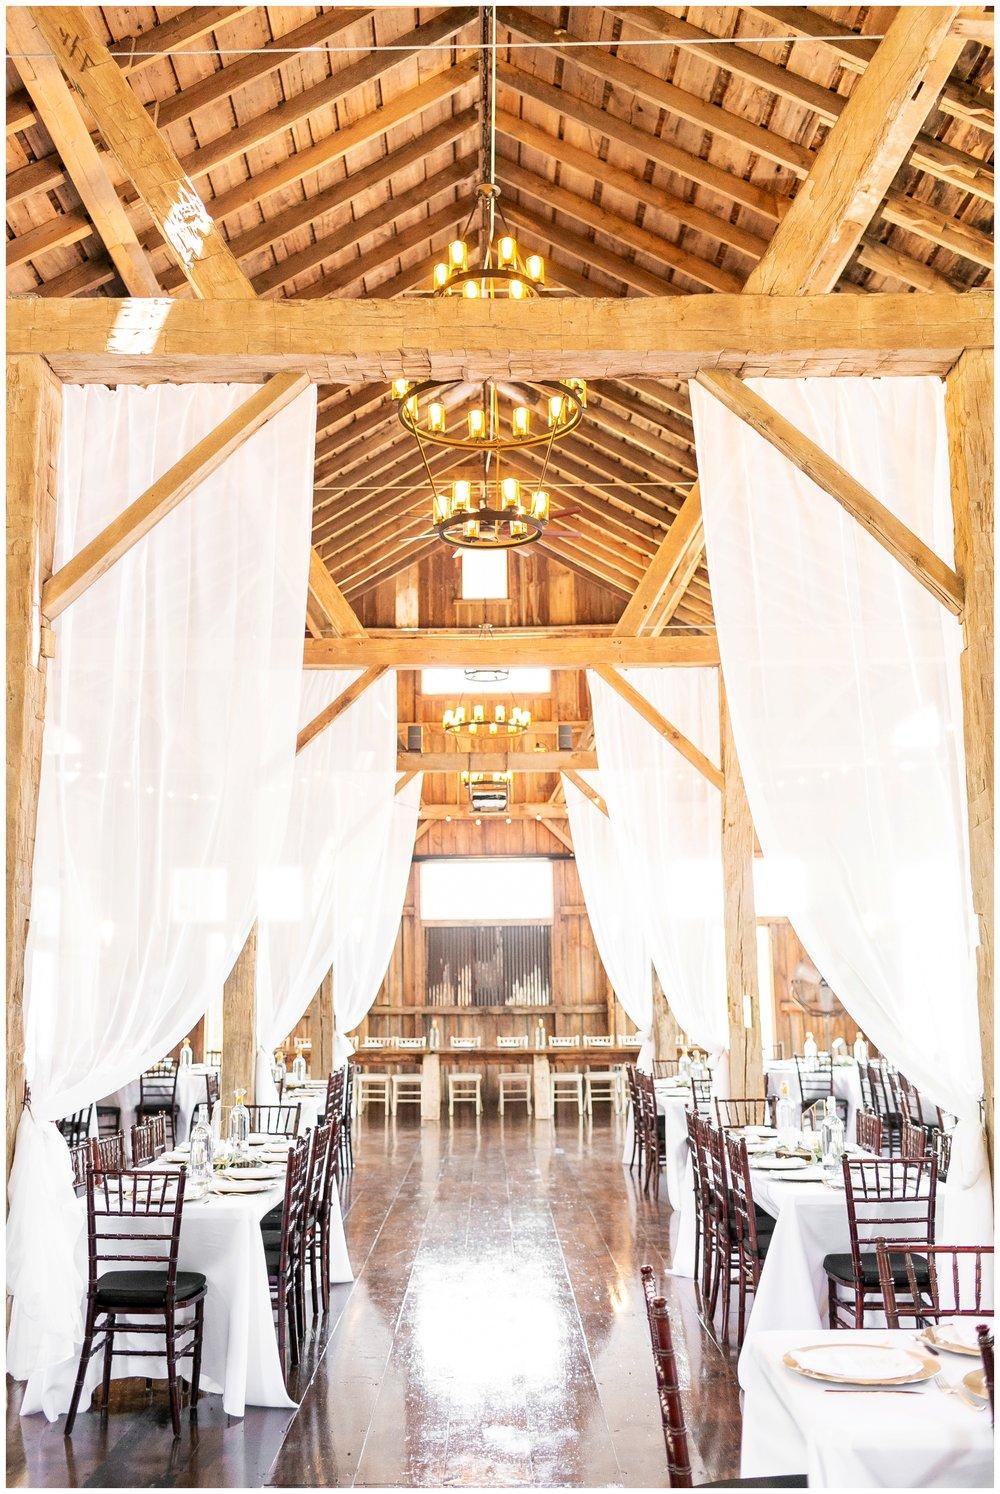 the_cupola_barn_wedding_delafield_resort_oconomowoc_wisconsin_0375.jpg